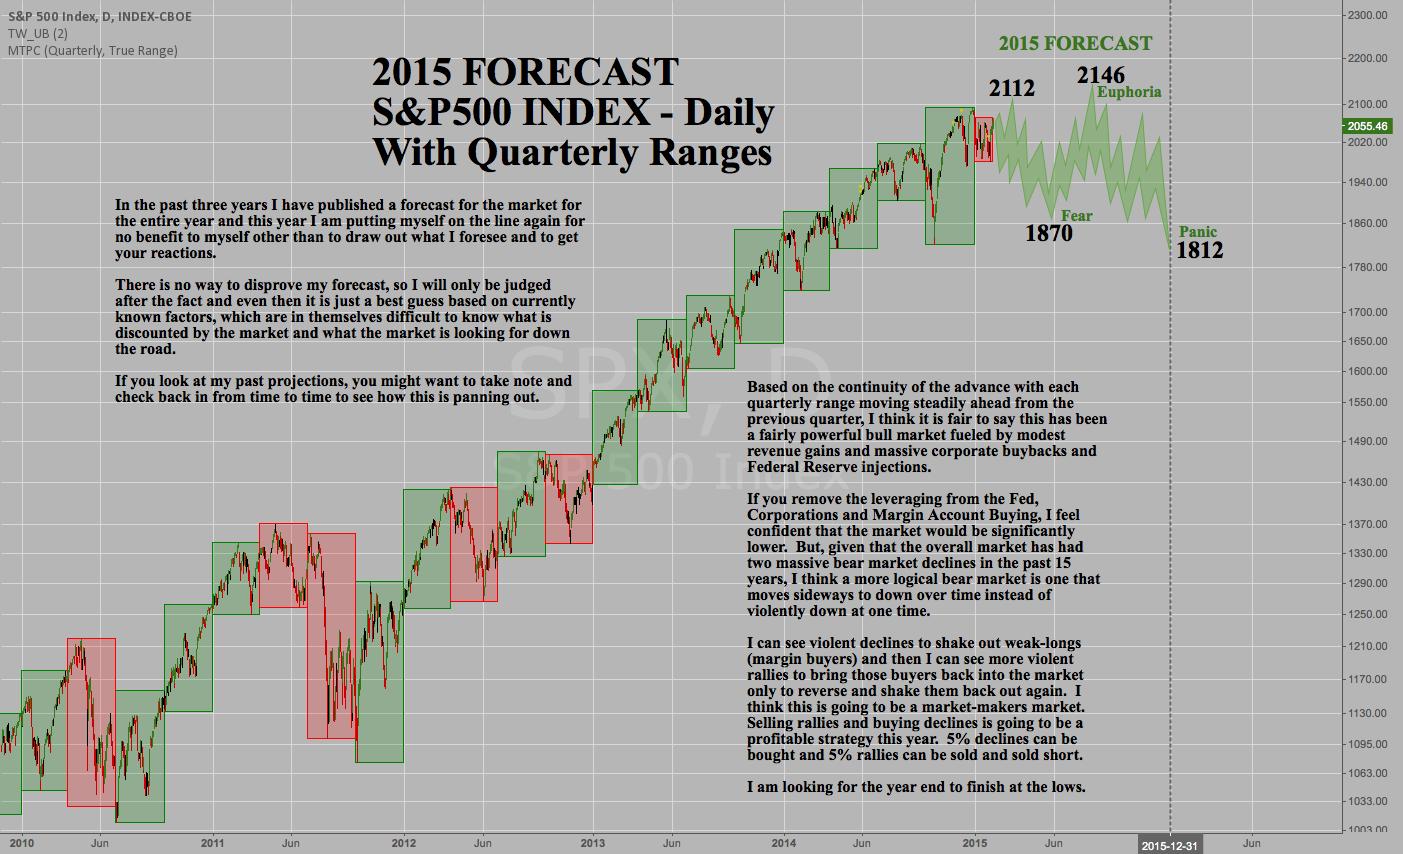 Tim West's 2015 S&P500 Stock Market Forecast